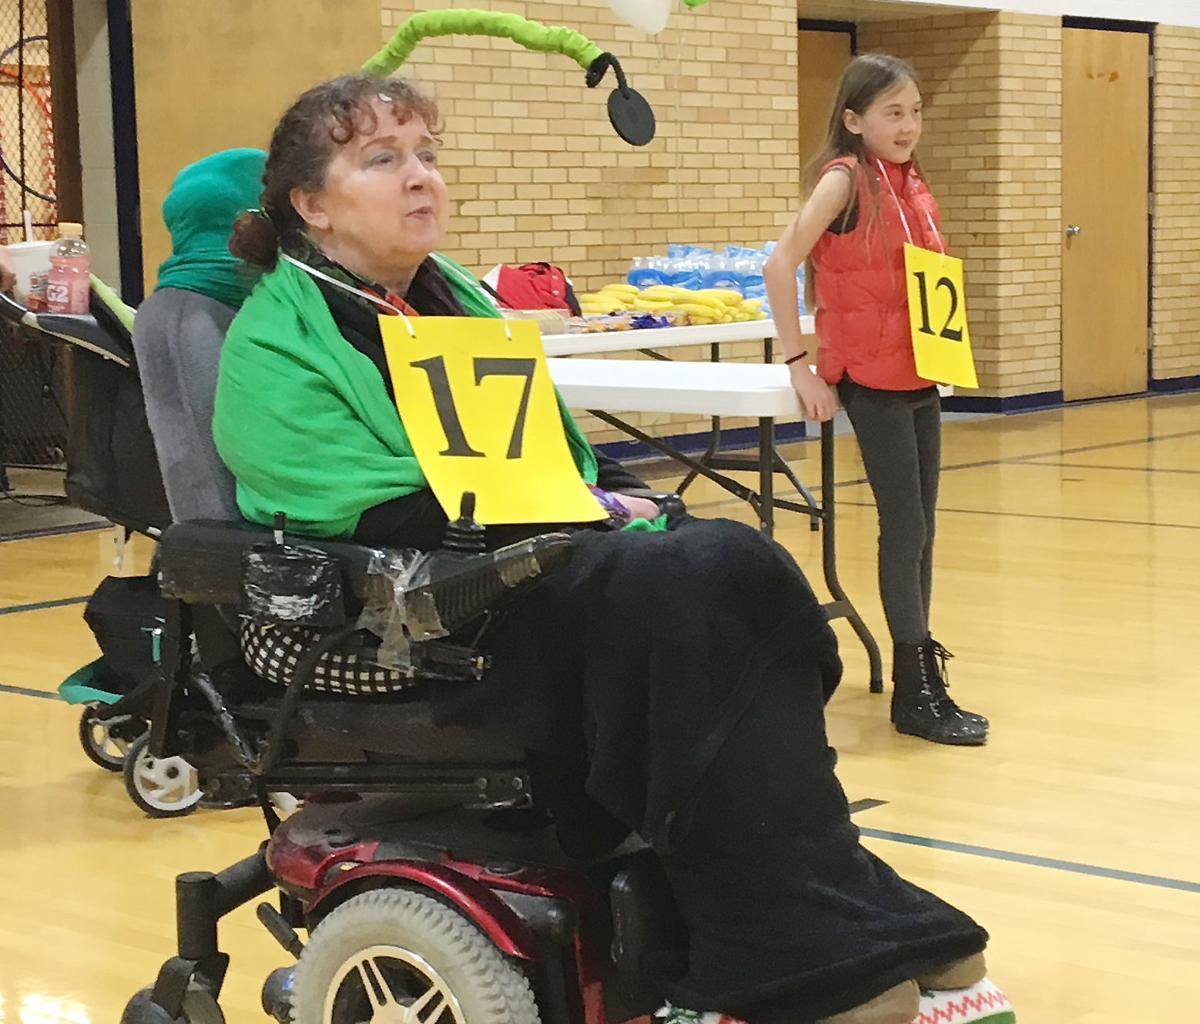 Wheelchair race 2